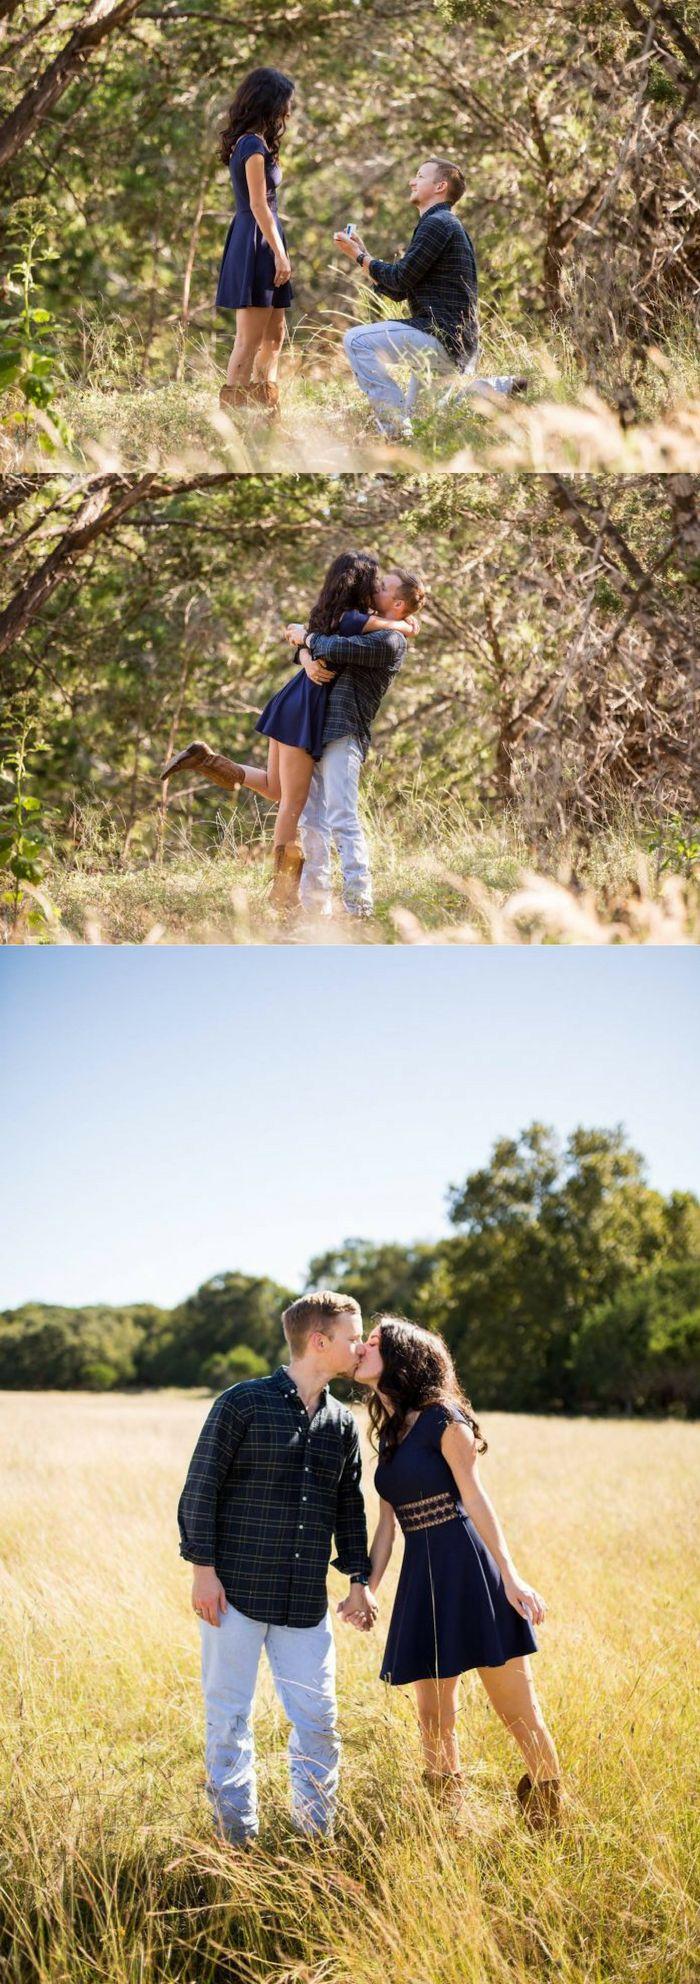 25 best ideas about Best proposals on Pinterest  Best wedding proposals Engagement proposal